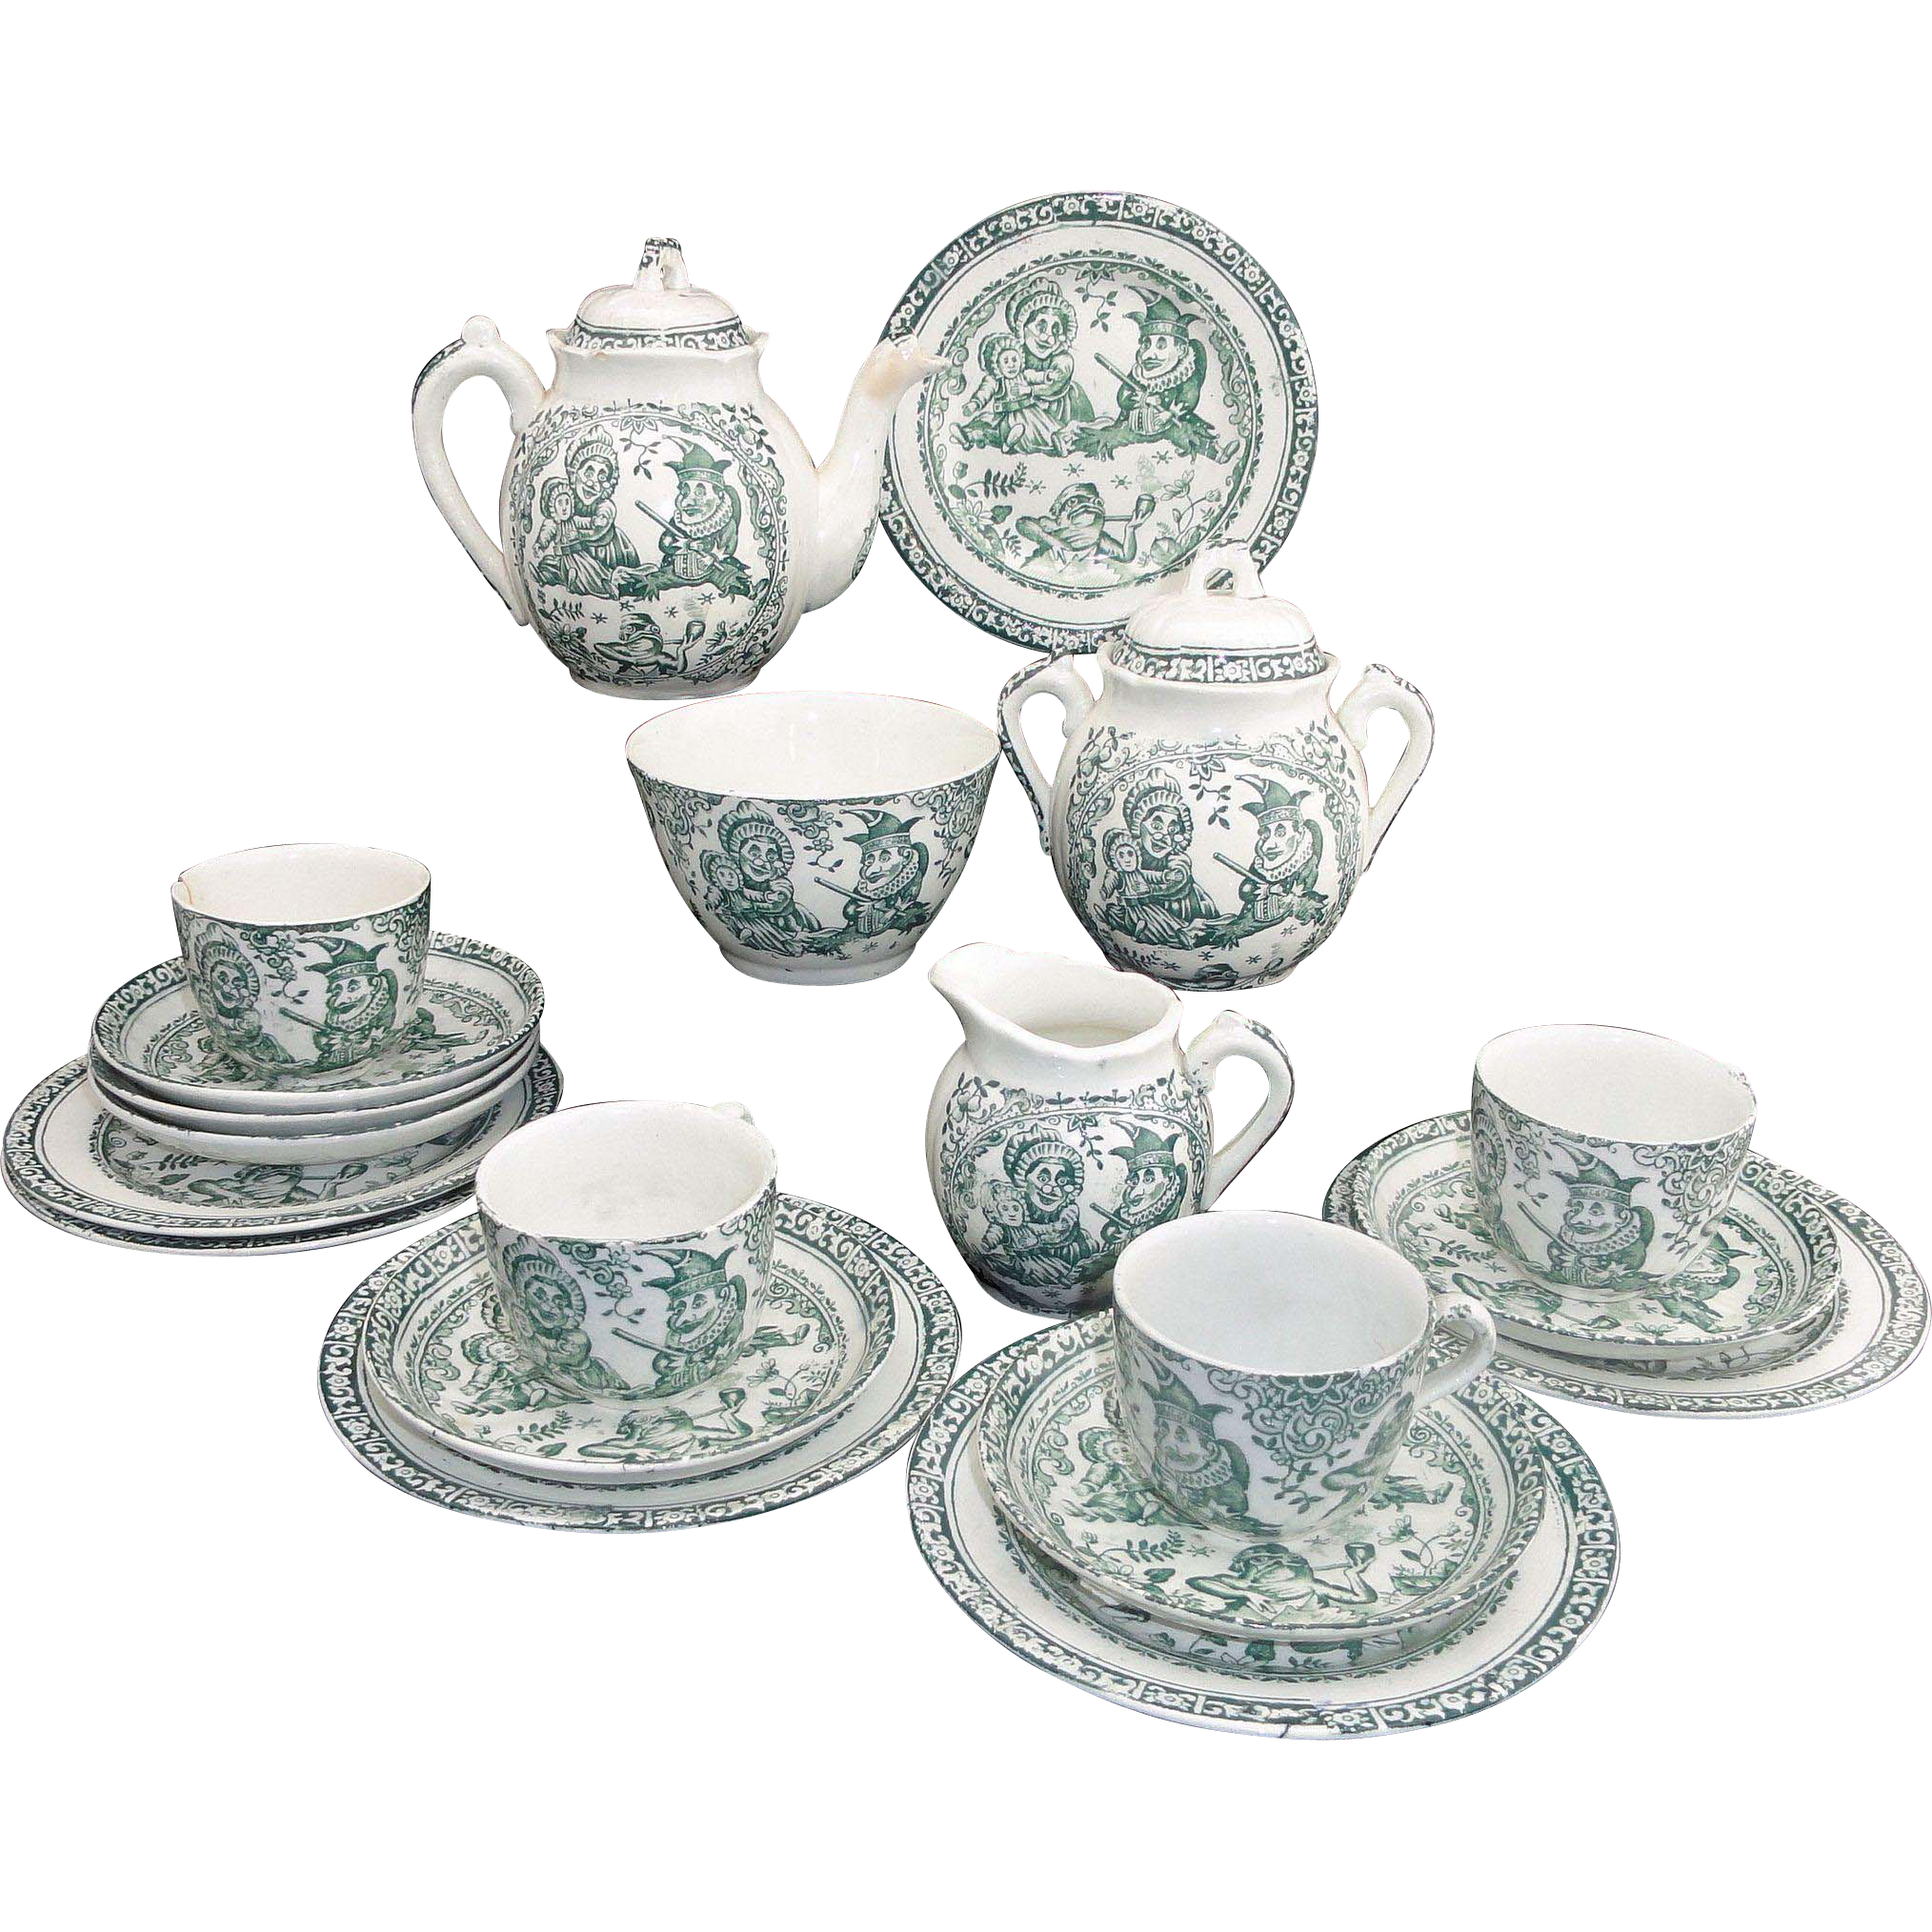 Punch & Judy Childs Tea Set Allerton 1880 Green Staffordshire Transferware